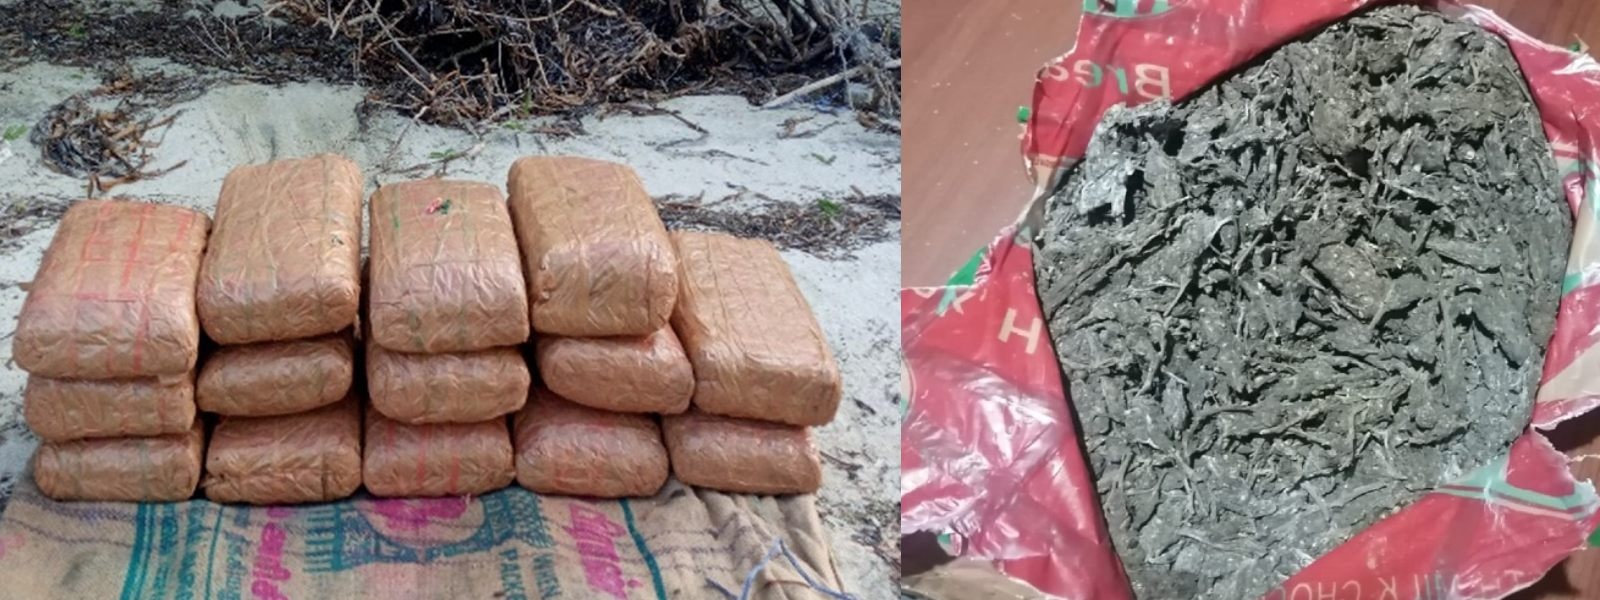 Navy recovers 31kg of Kerala cannabis at Manthai beach